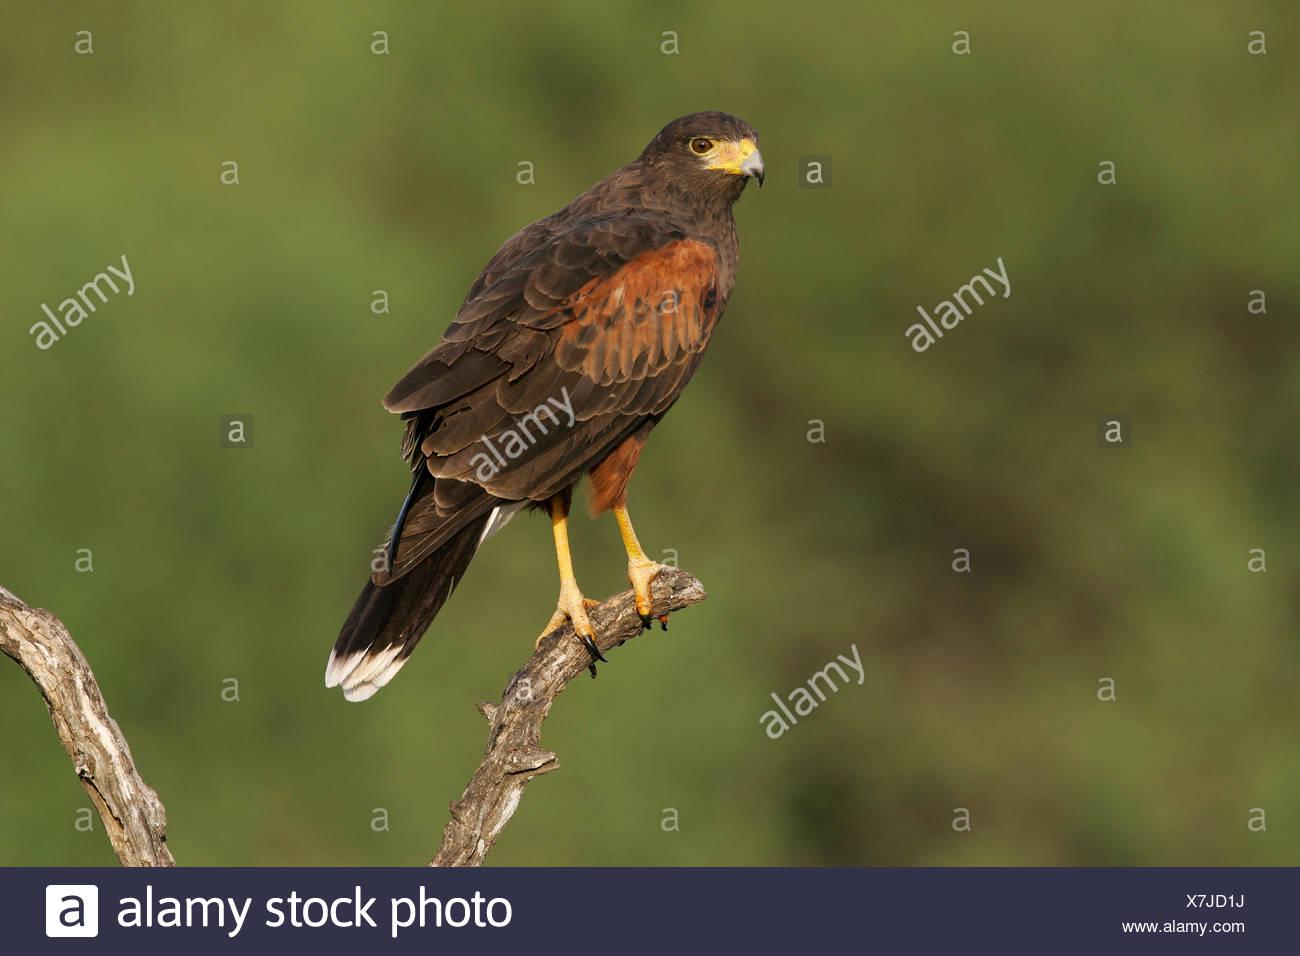 Harris's Hawk - Parabuteo unicinctus - adult - Stock Image